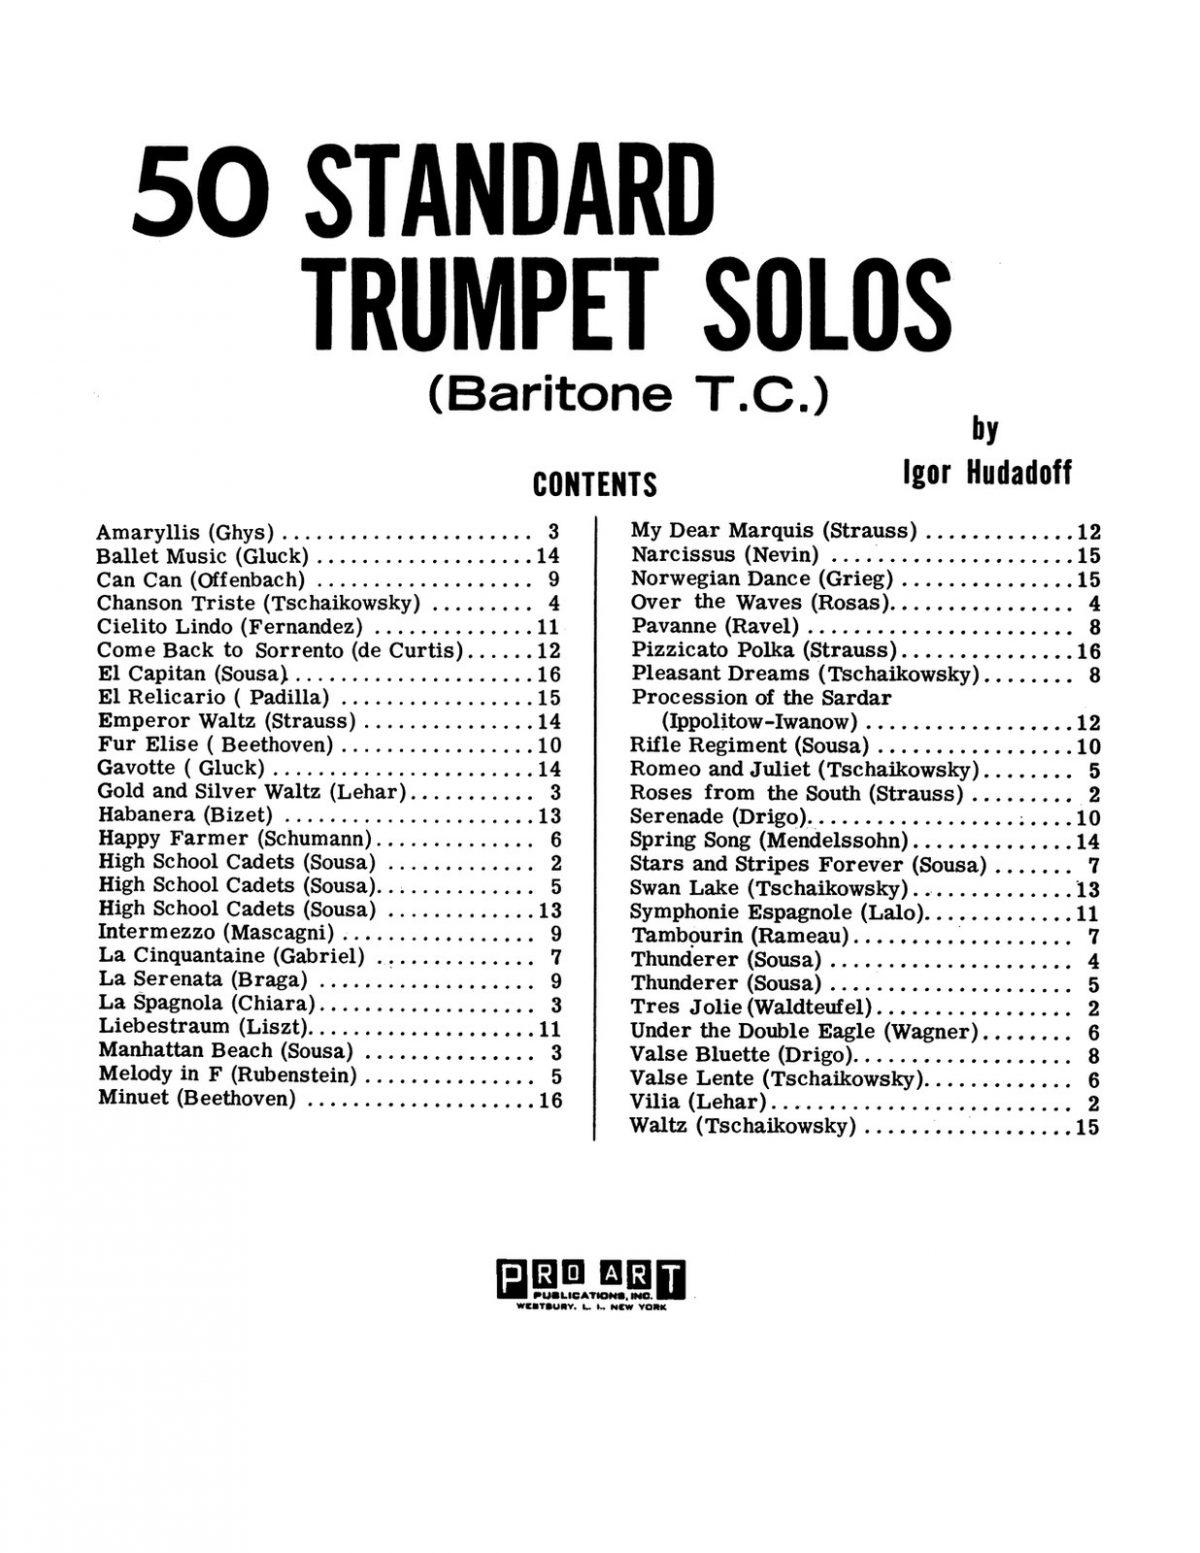 Hudadoff, 50 Standard Trumpet Solos-p05